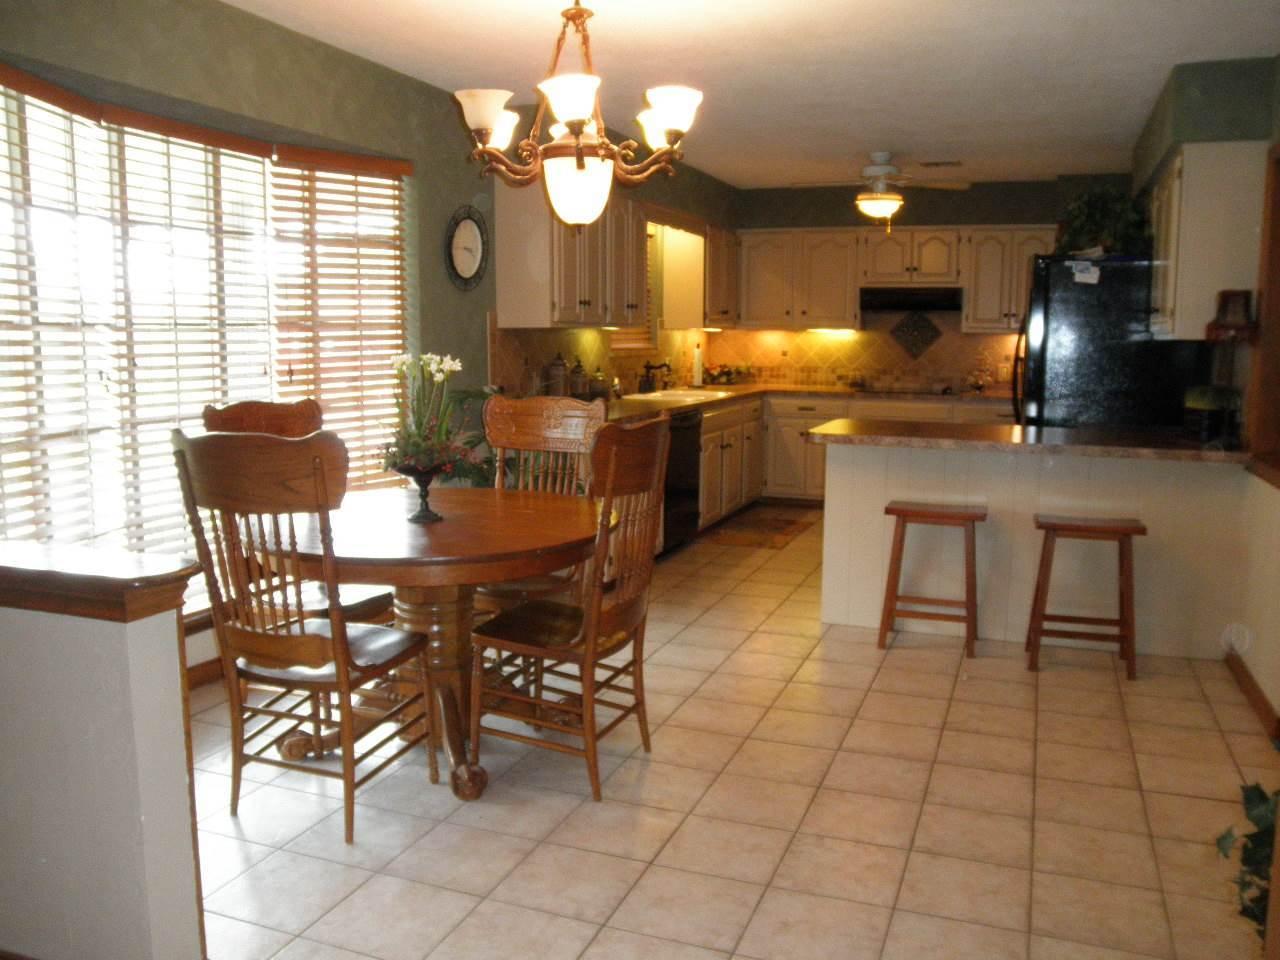 Sold Cross Sale W/ MLS | 2805 Ames  Ponca City, OK  12